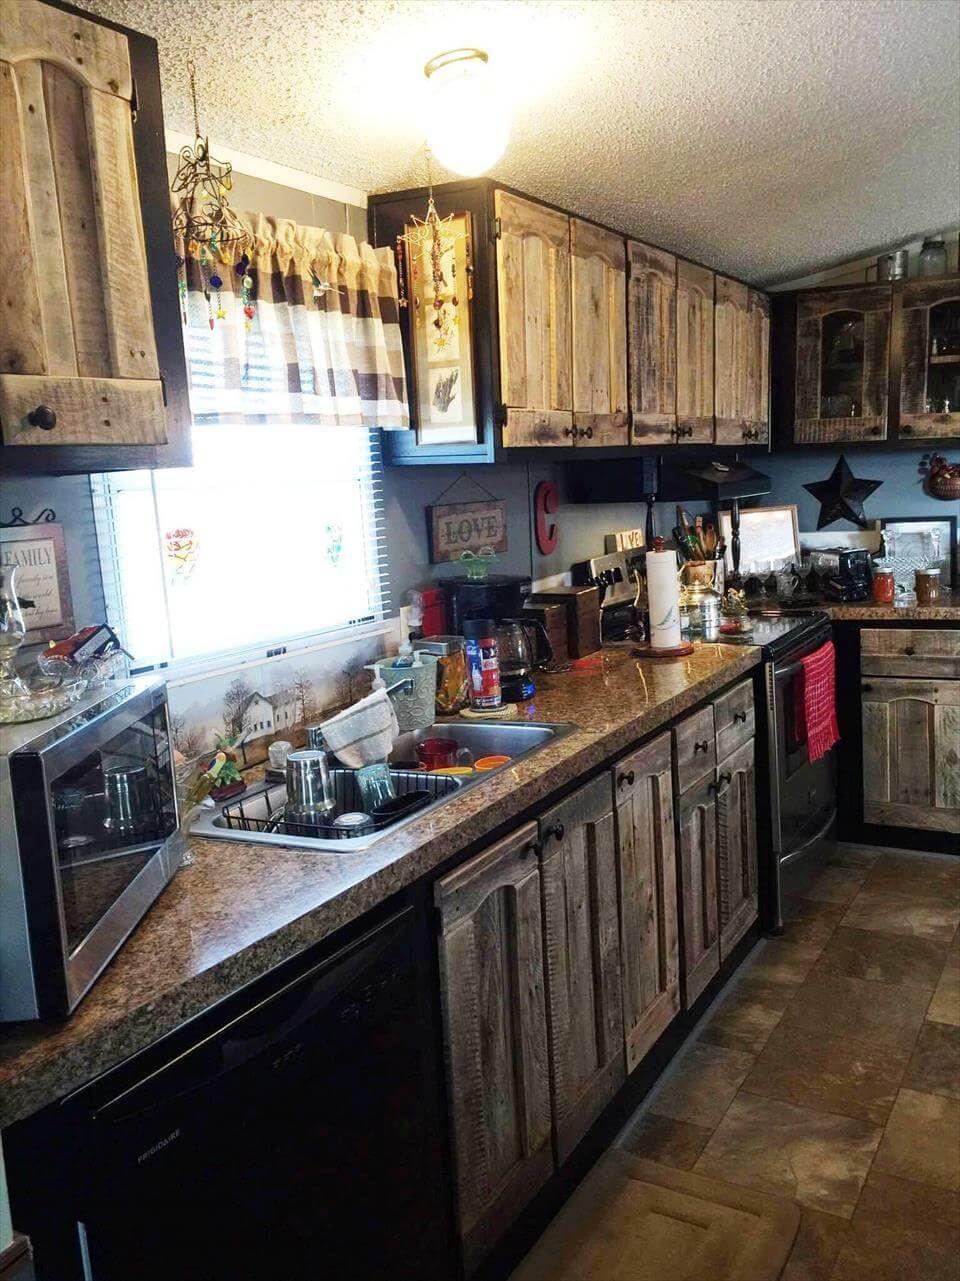 Kitchen Cabinets Using Old Pallets   Pallet kitchen ...